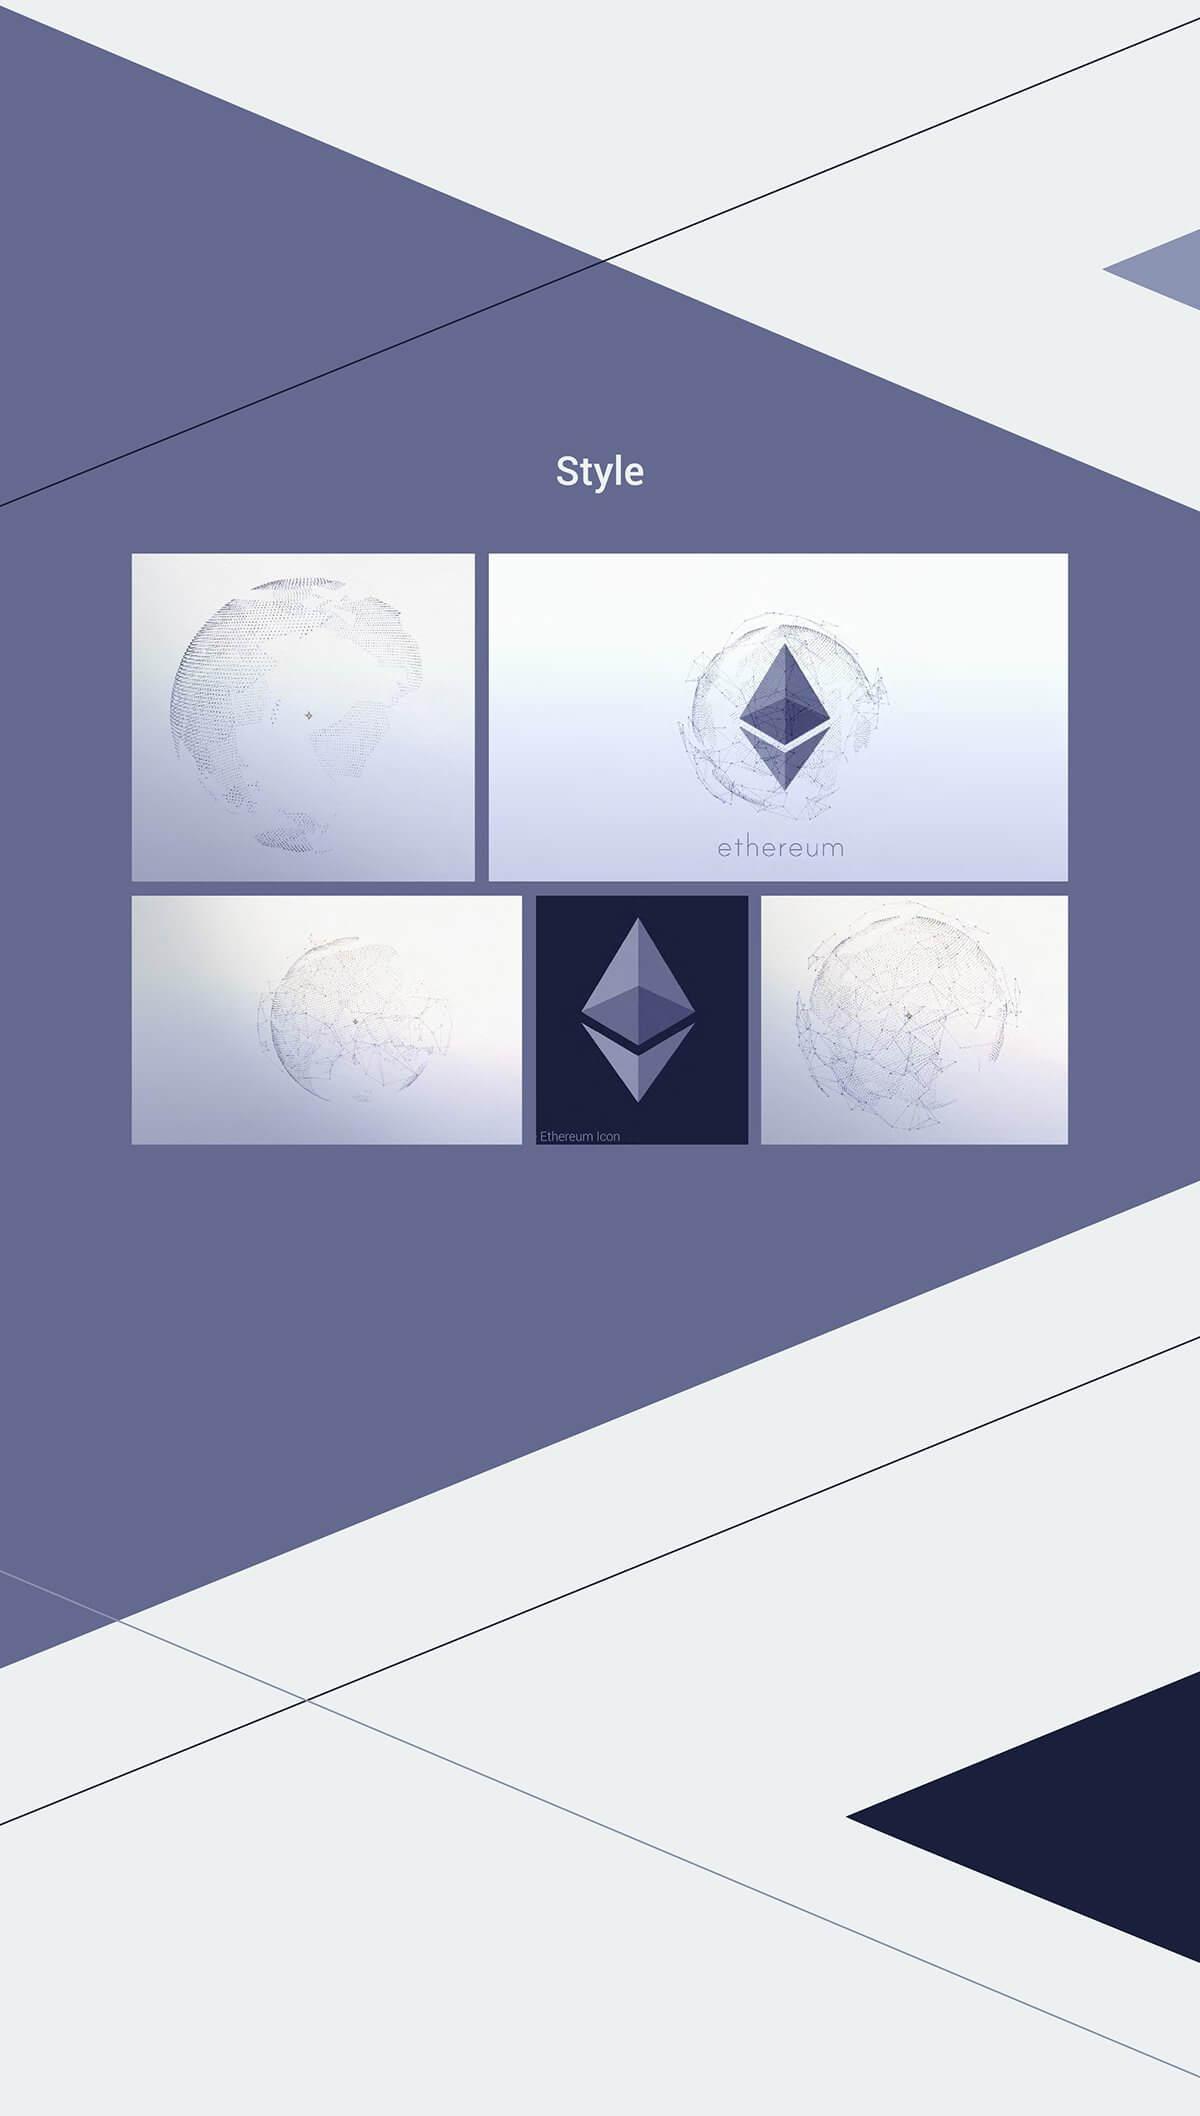 ethereum explainer content styleframes